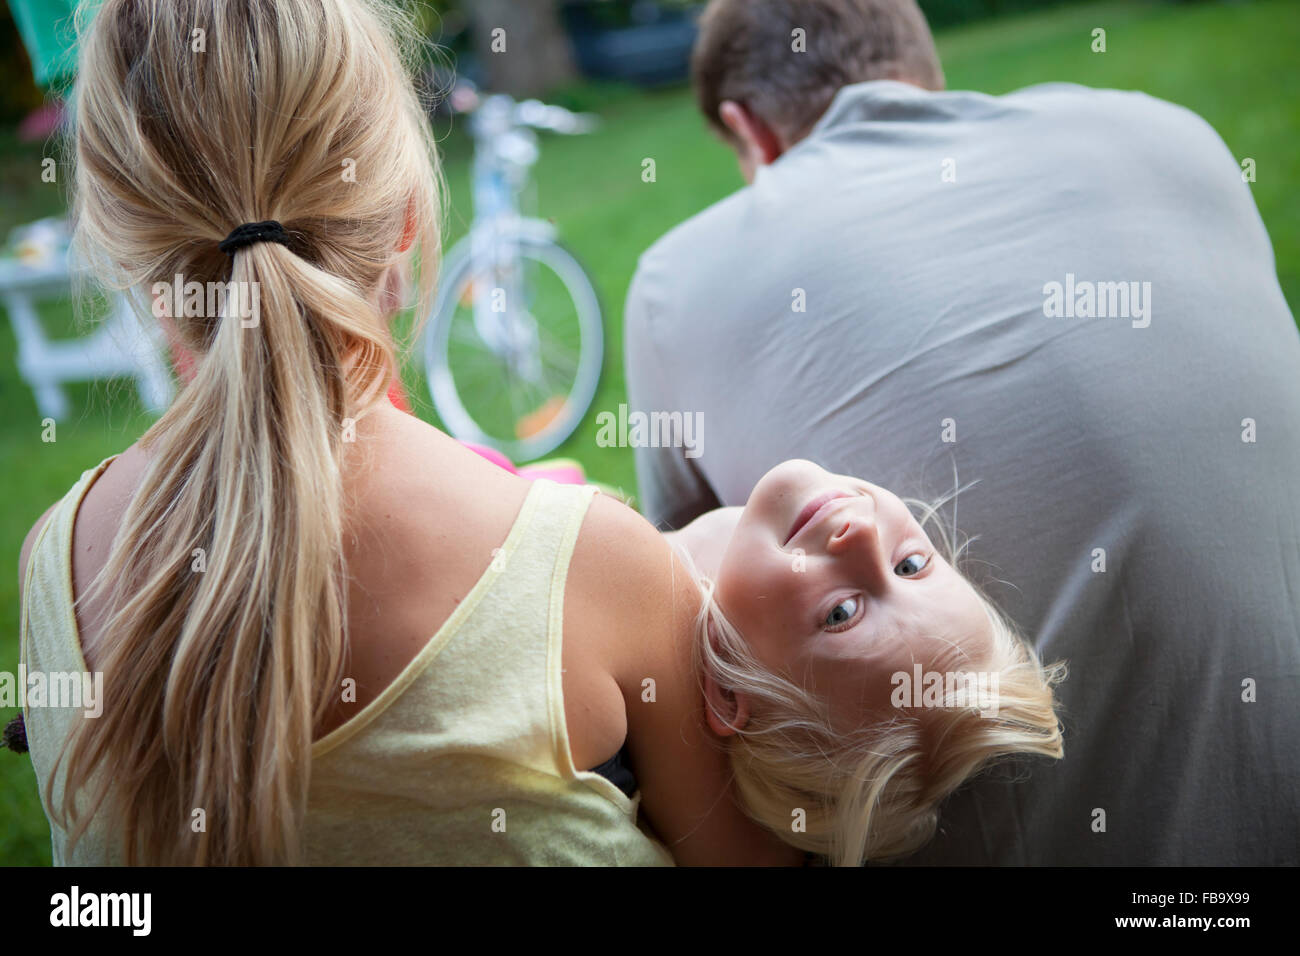 Suecia, Narke, Filipshyttan, Retrato de las niñas (6-7, 14-15) con el p. Imagen De Stock